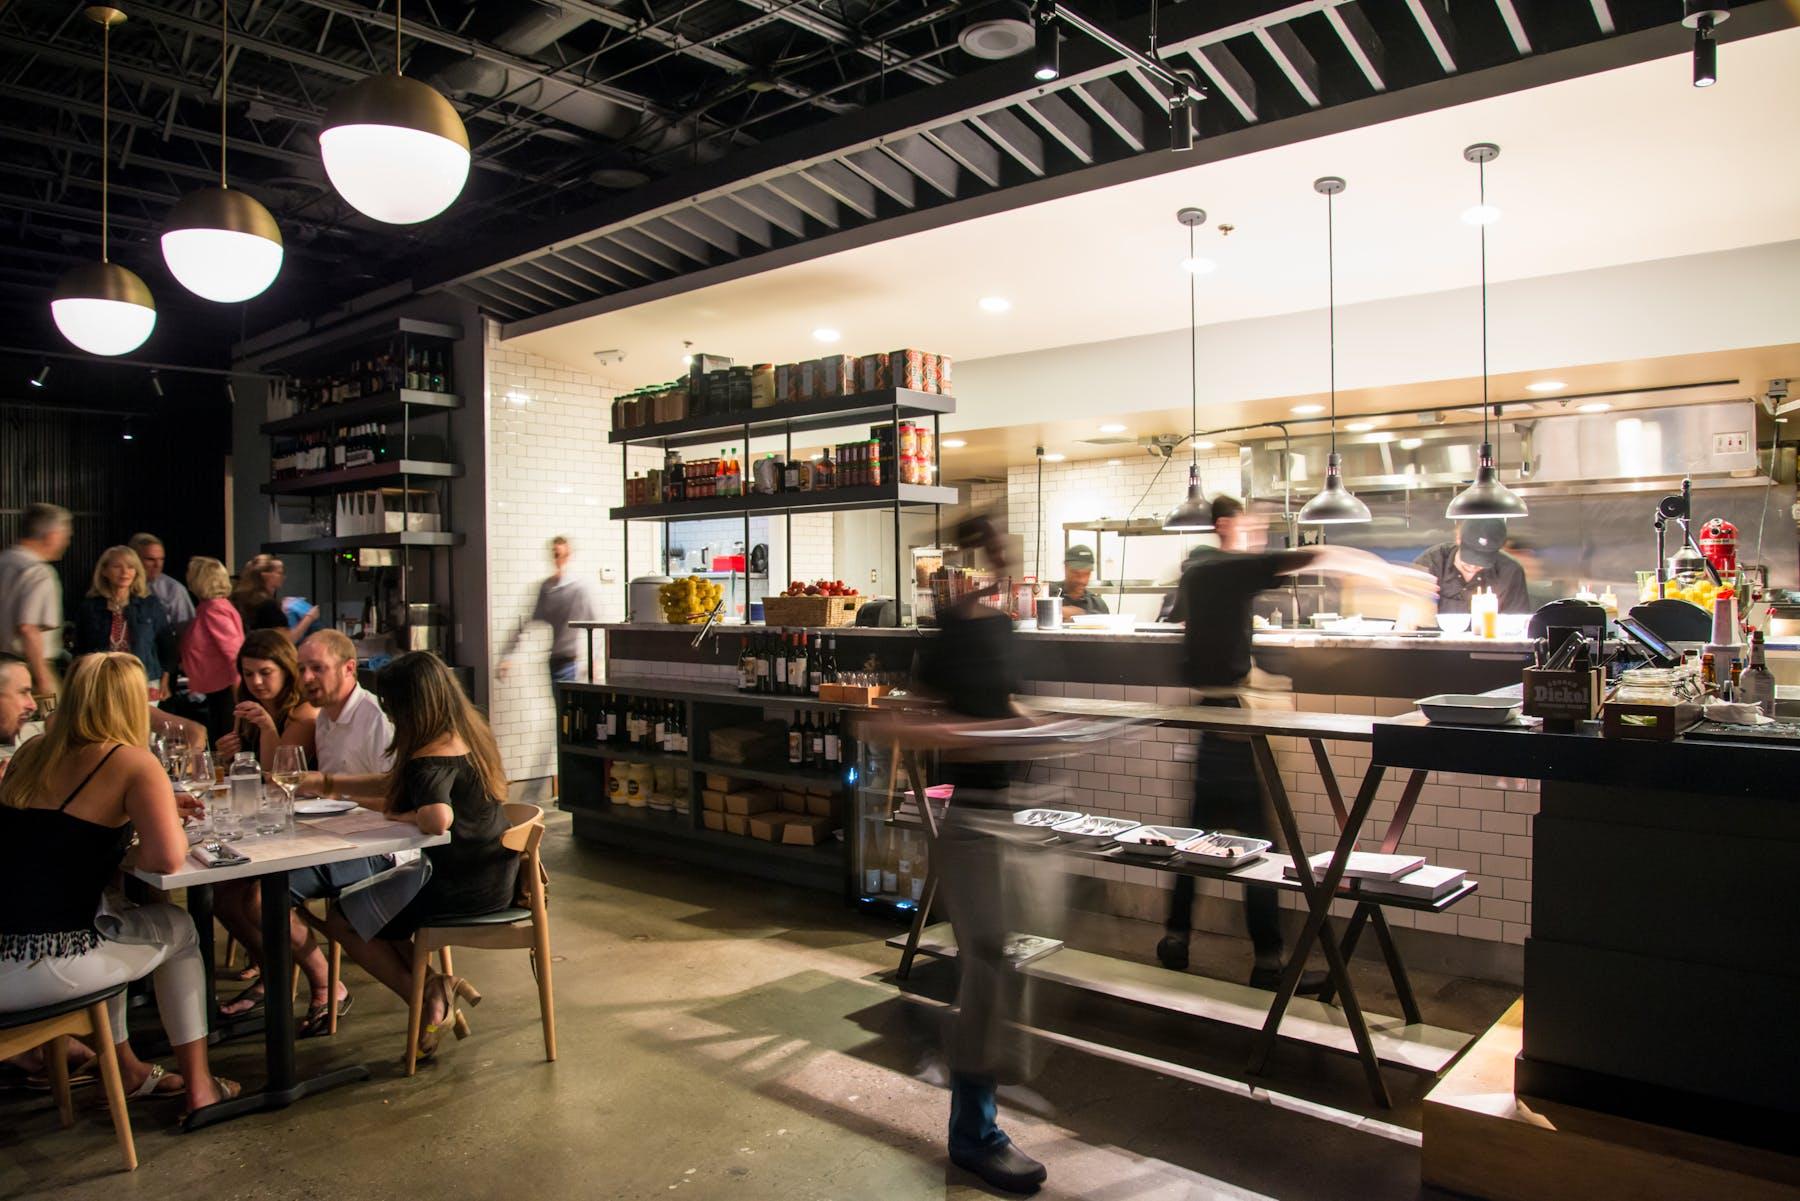 Open exhibition style kitchen